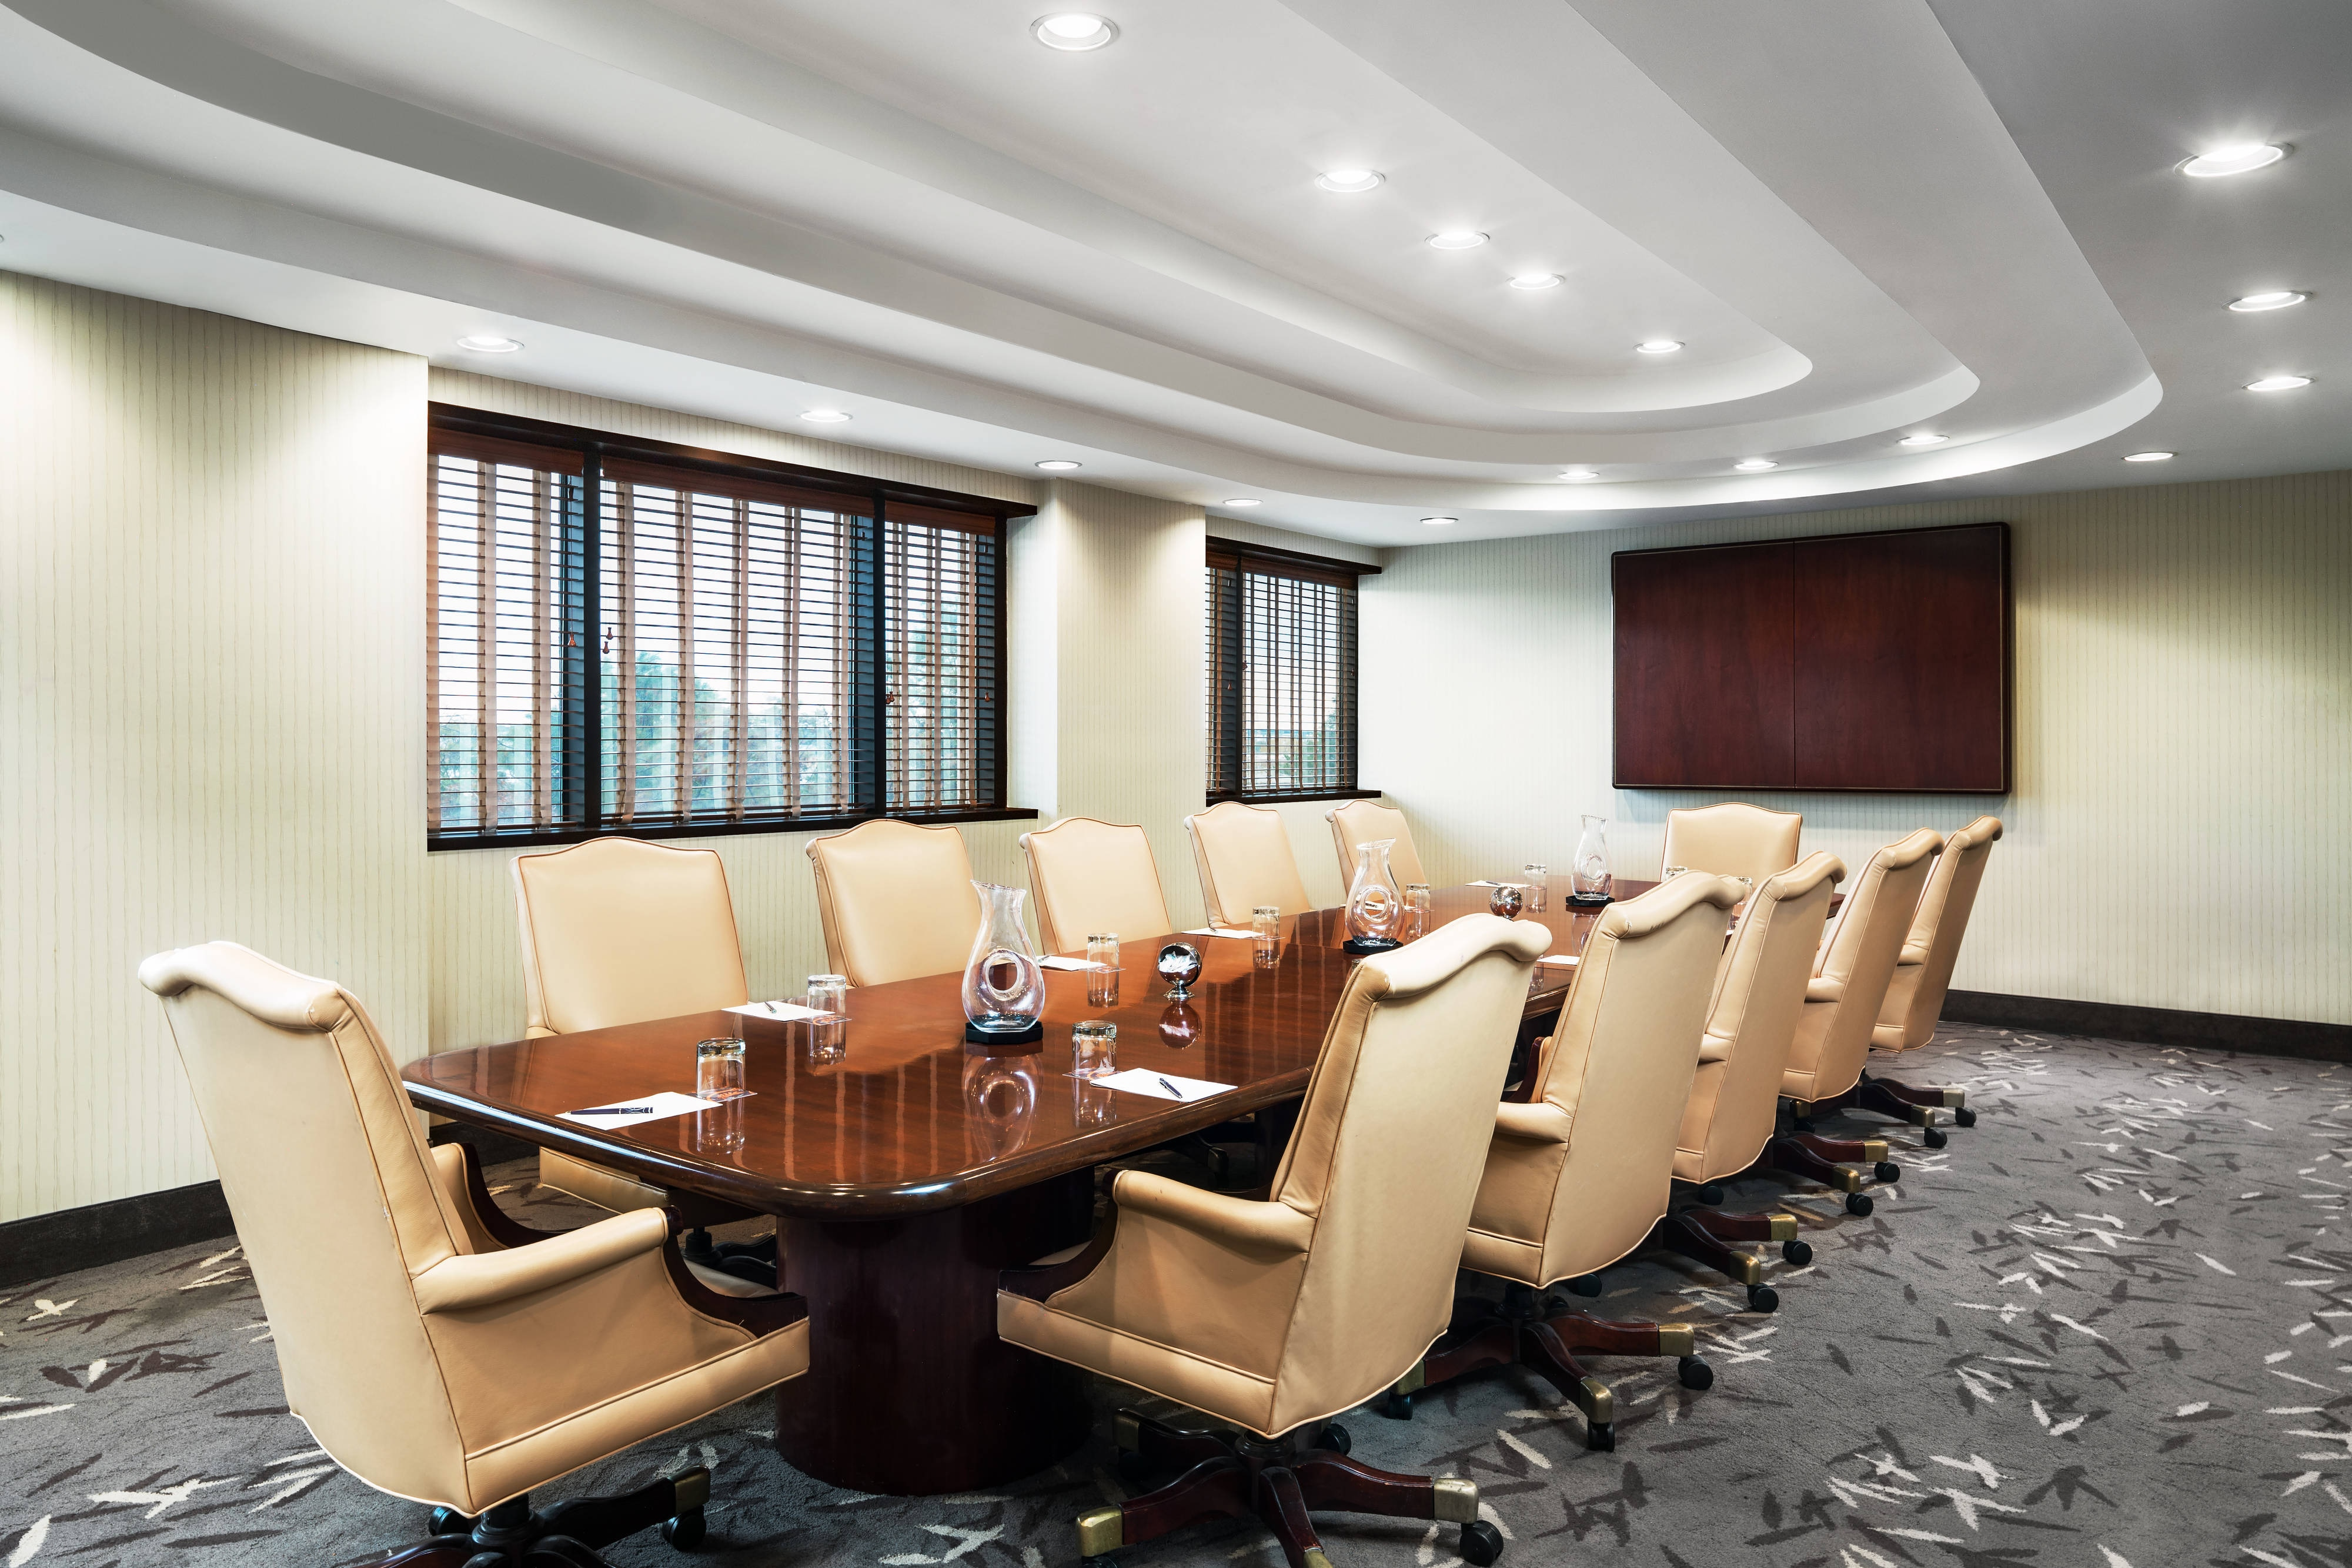 westinghouse Boardroom